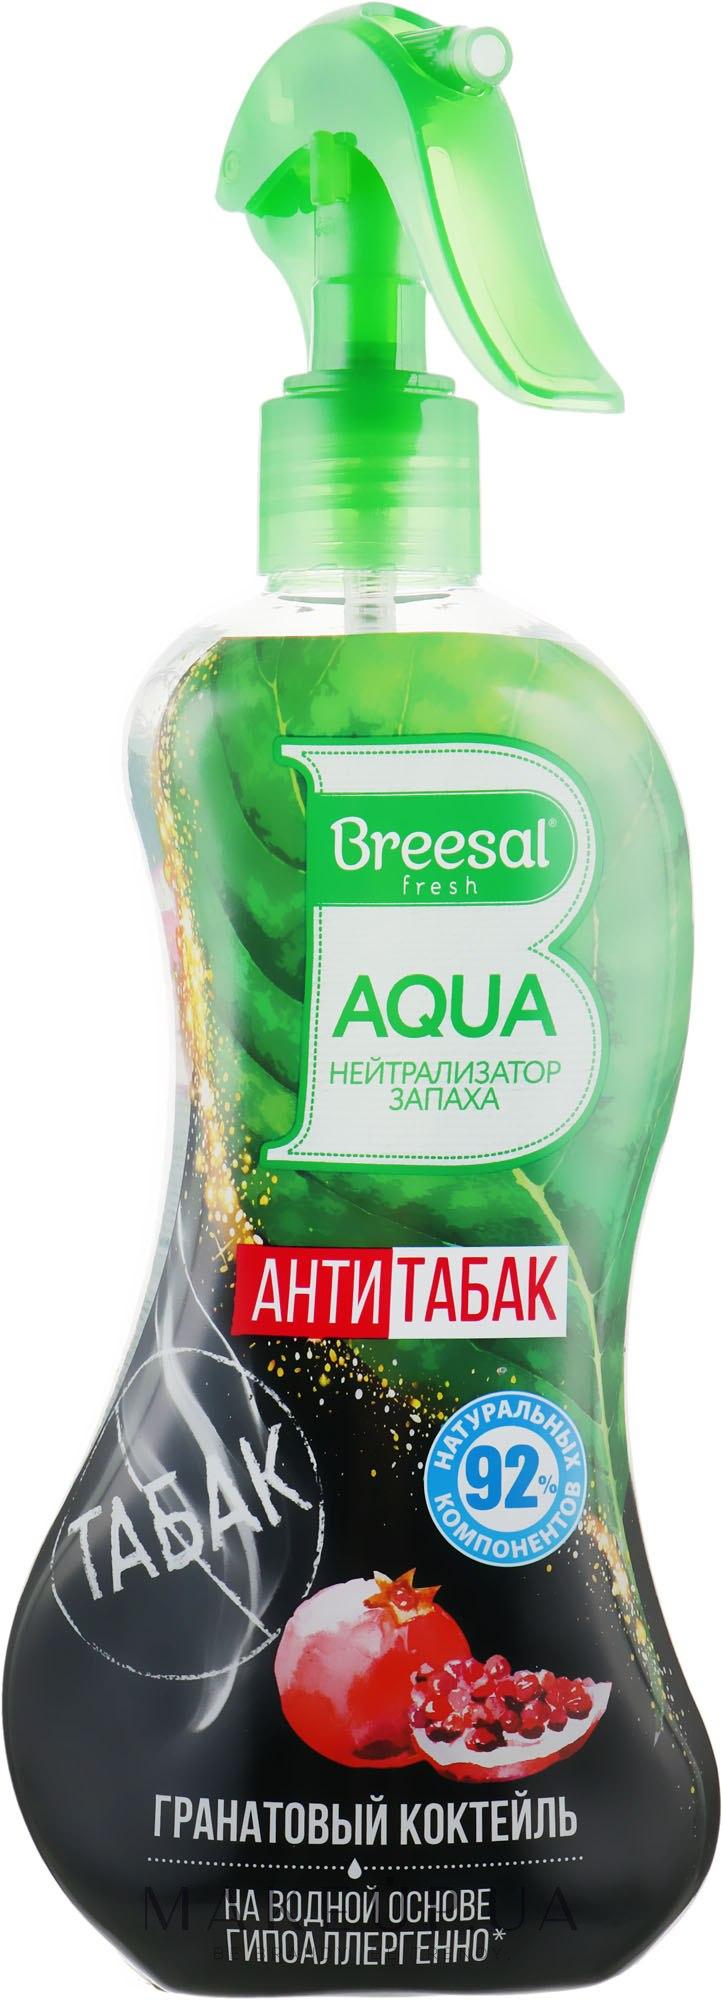 Купить Breesal Aqua-нейтрализатор запаха антитабак Гранатовый коктейль 375 мл (Breesal, Нейтрализация запаха Breesal Fresh)